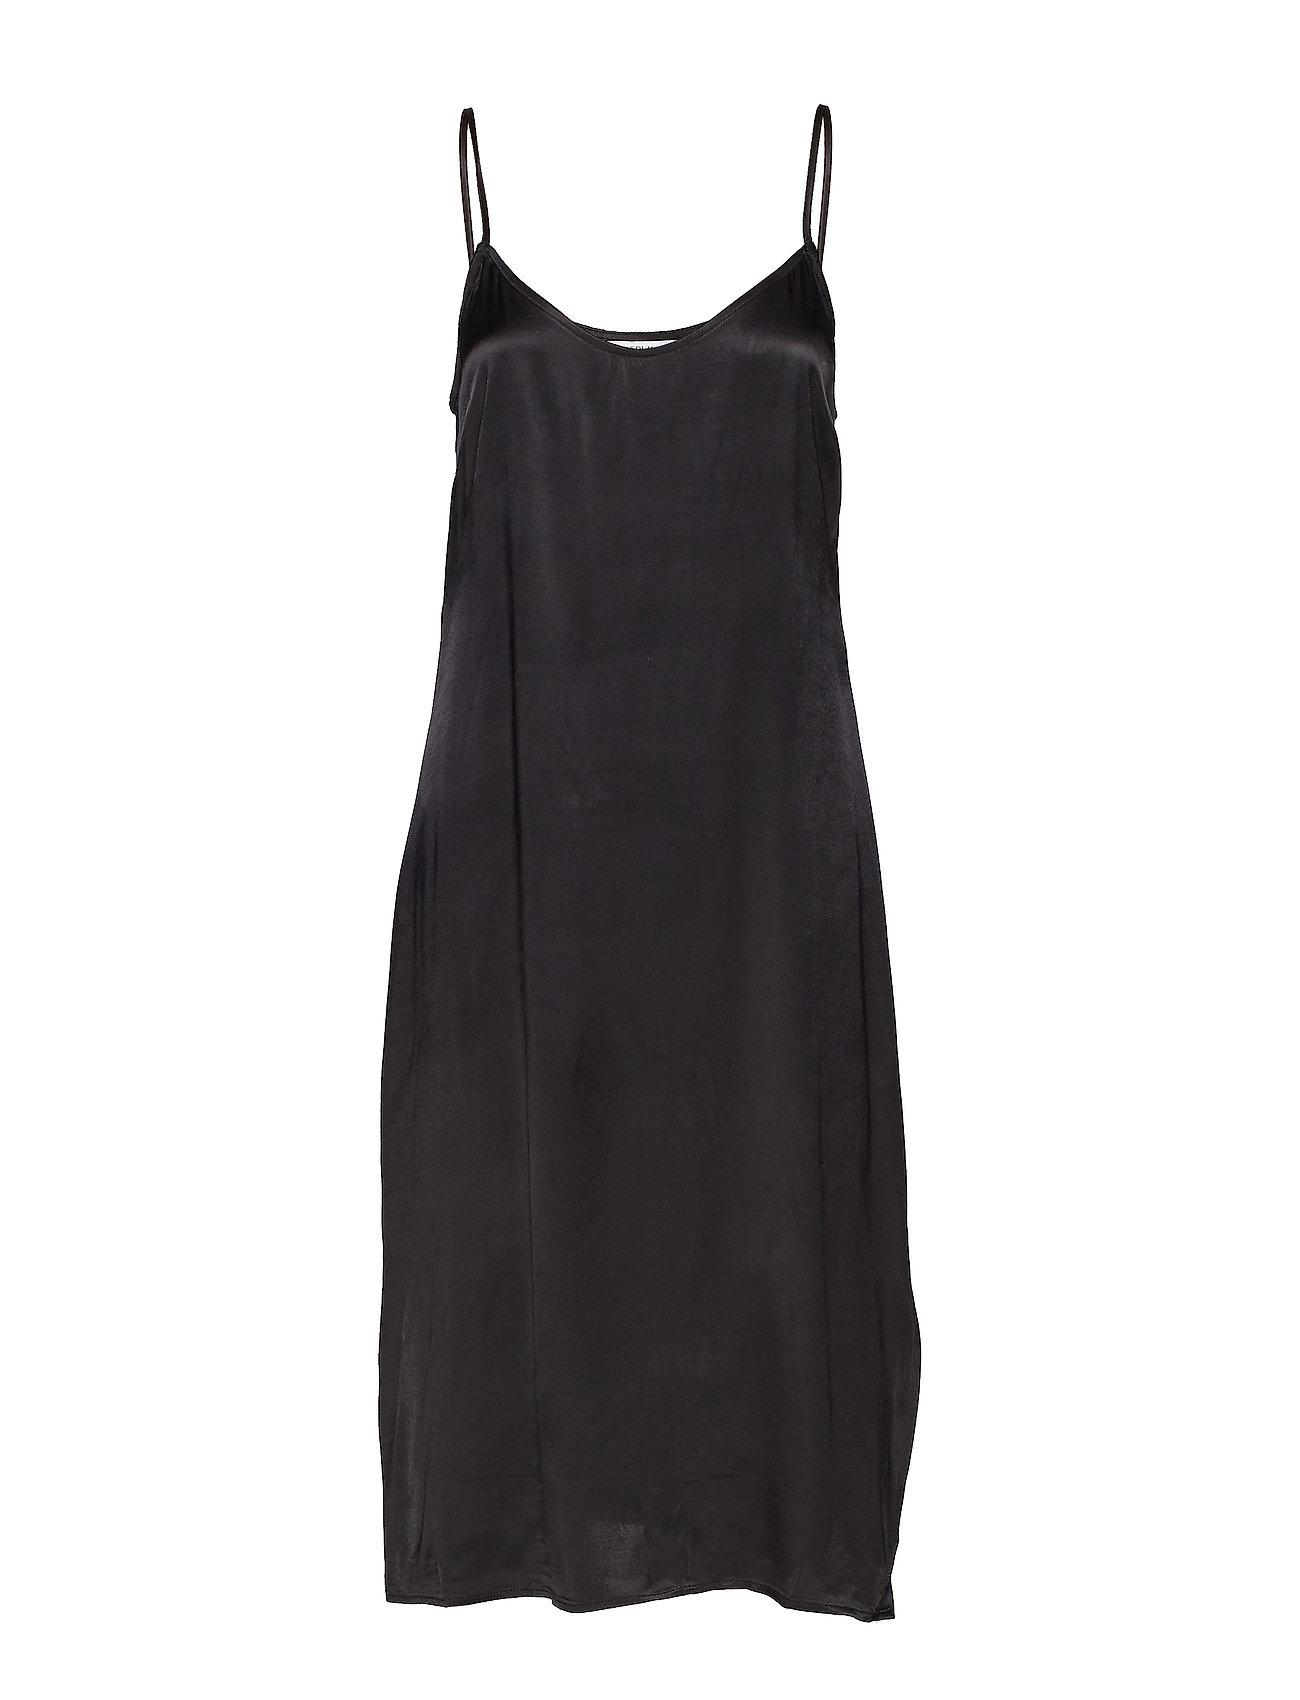 Envii ENOAKS SL DRESS 6650 - BLACK